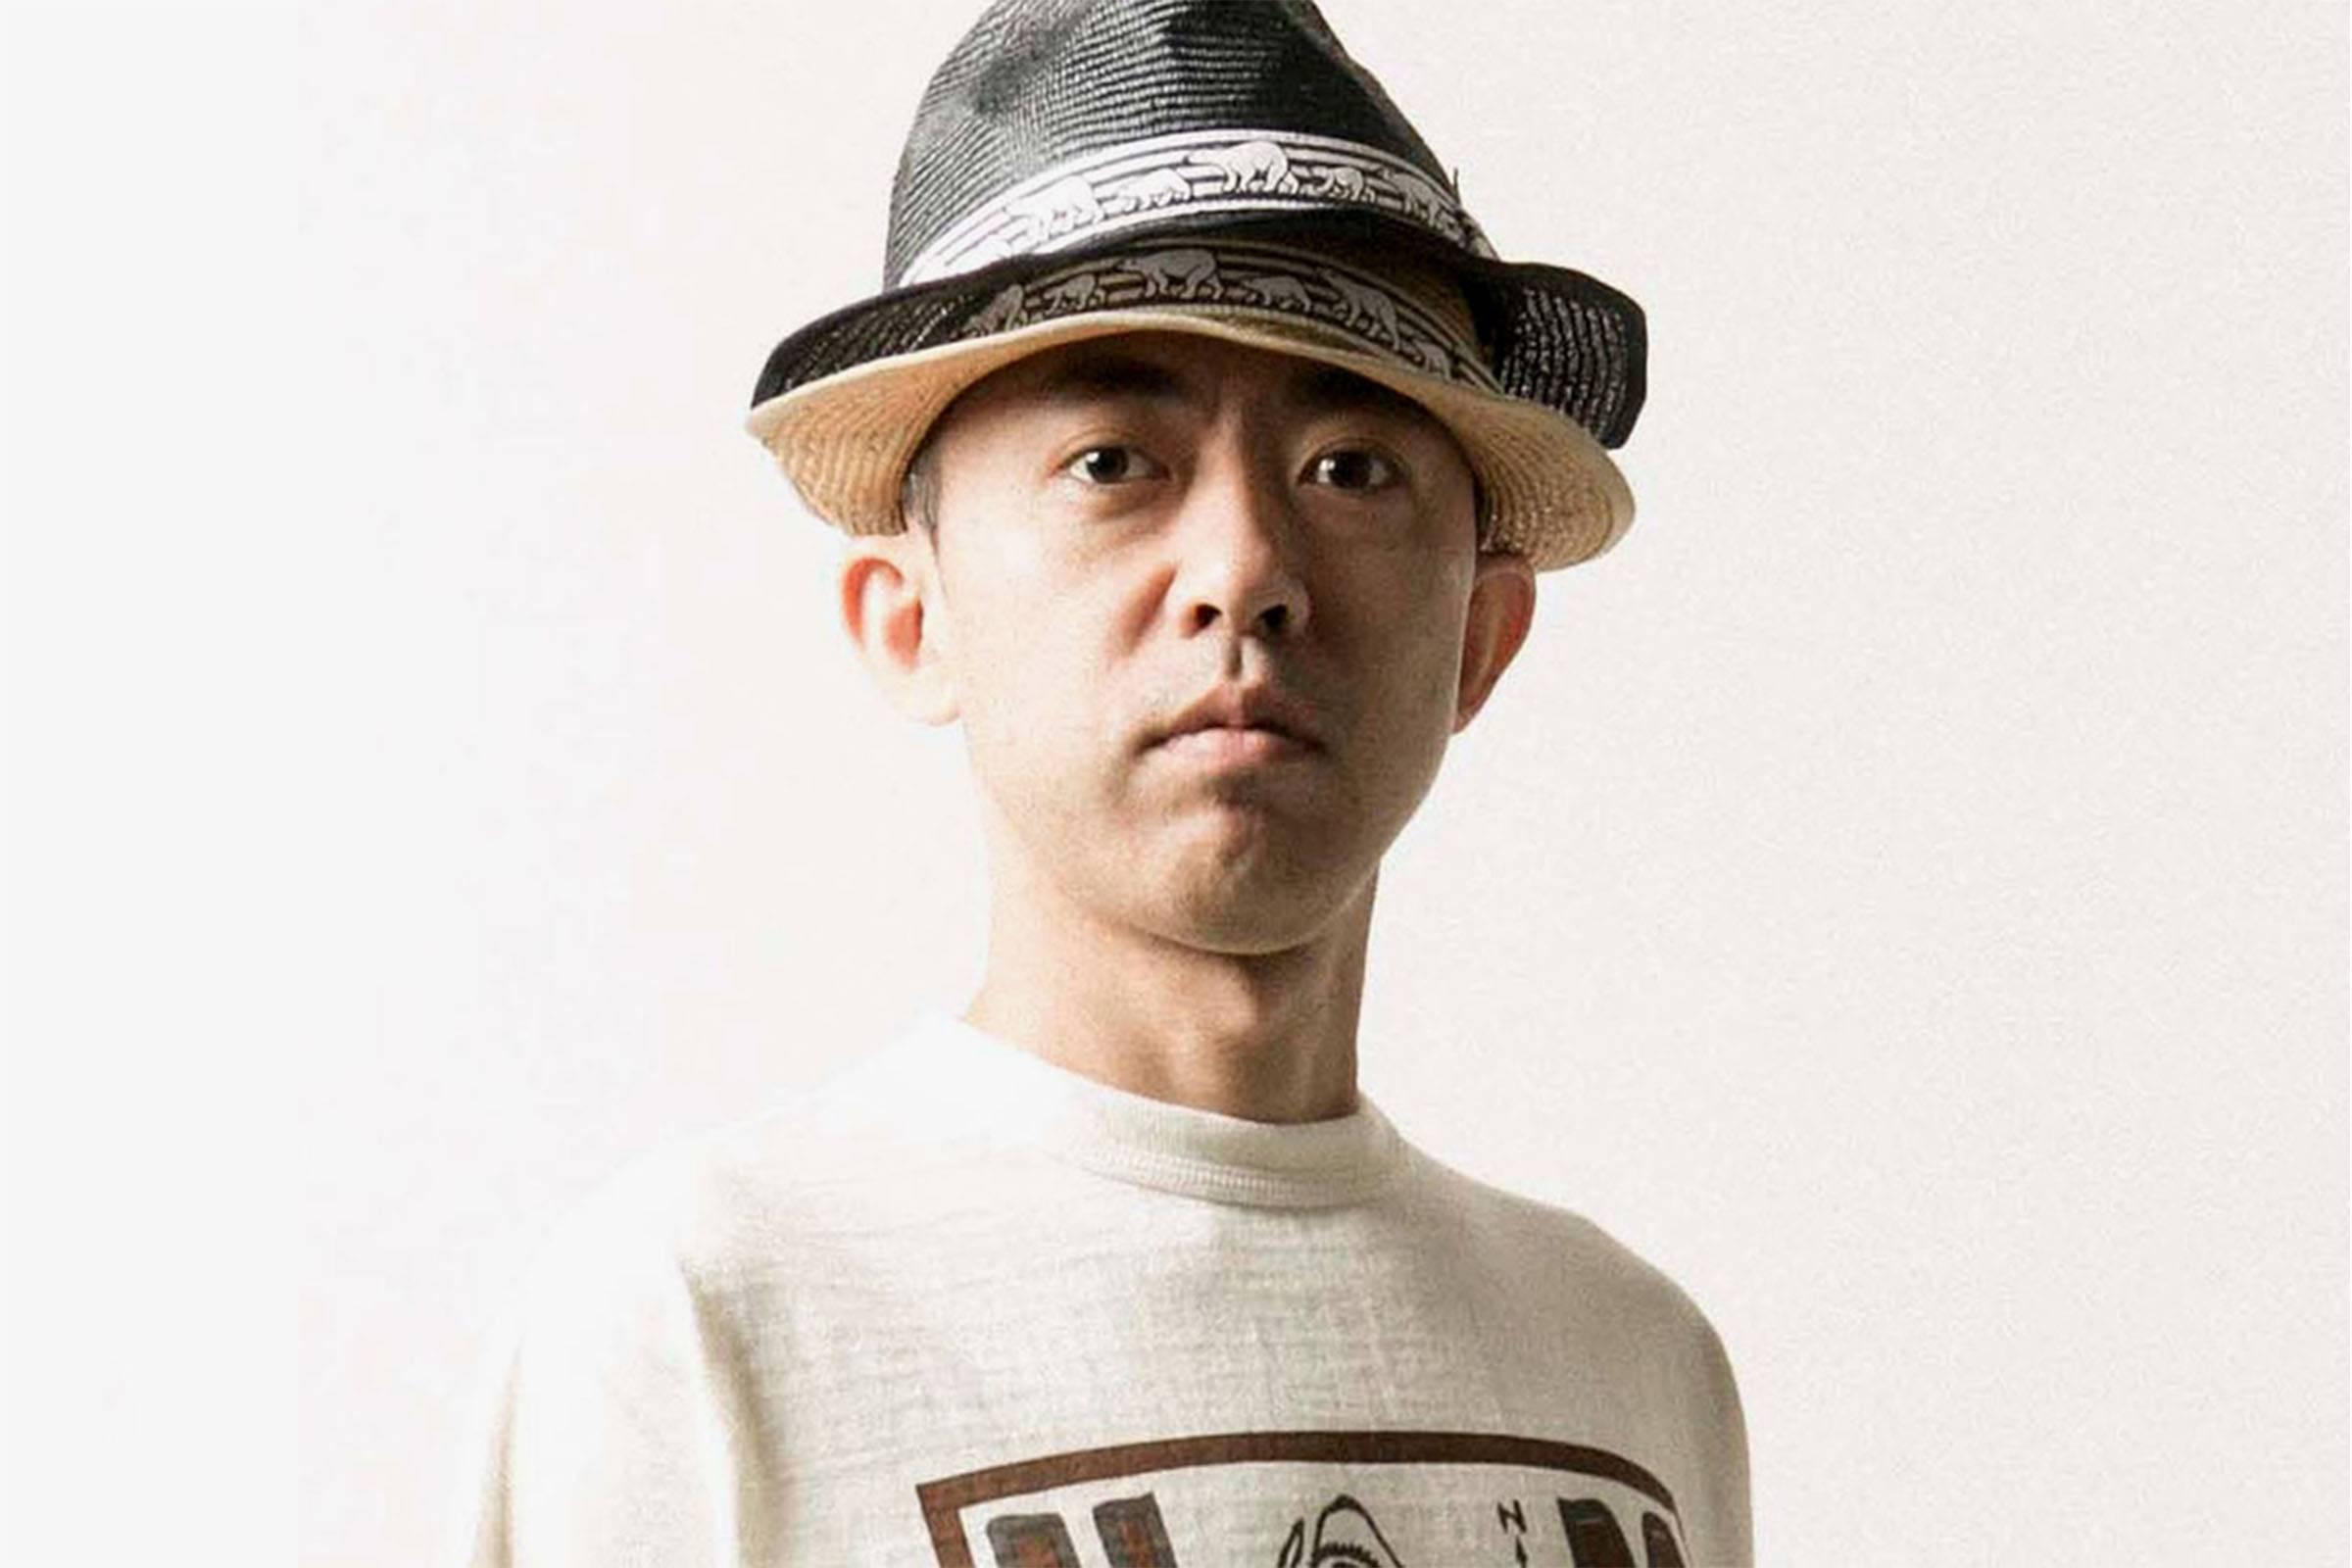 image via: [hypebeast](http://hypebeast.com/2015/9/nigo-appointed-as-new-creative-director-of-yoho)